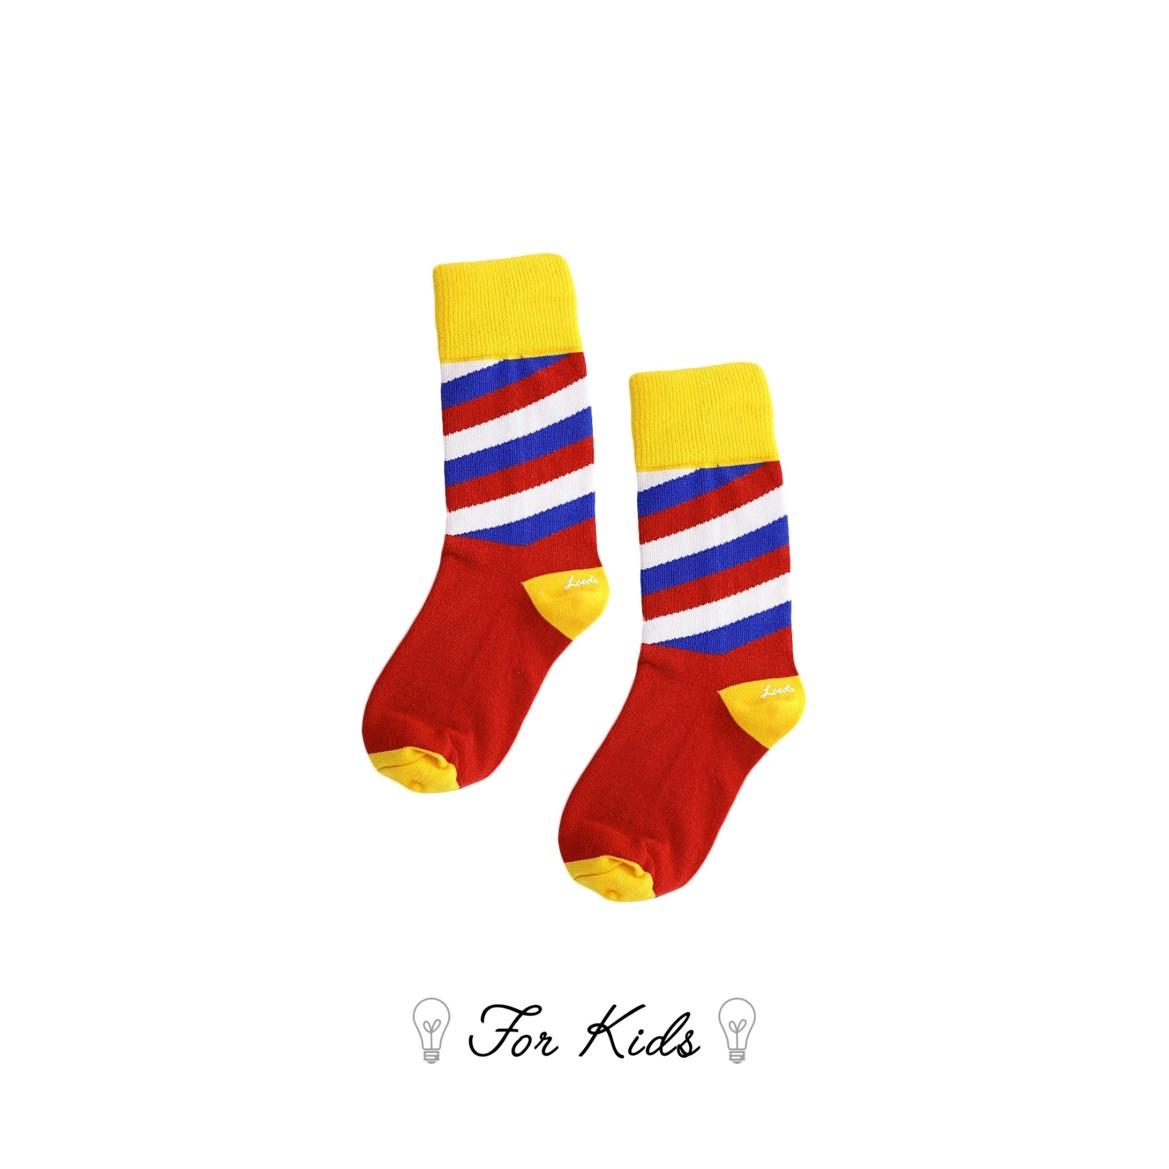 Leeds weather【英國設計】天然純棉孩童襪子★經典斜紋襪子【Cotton Socks Recommendations】- матрёшка ( Vice Versa 系列共8款) 皇室推薦御用童襪、可愛穿搭、透氣舒適